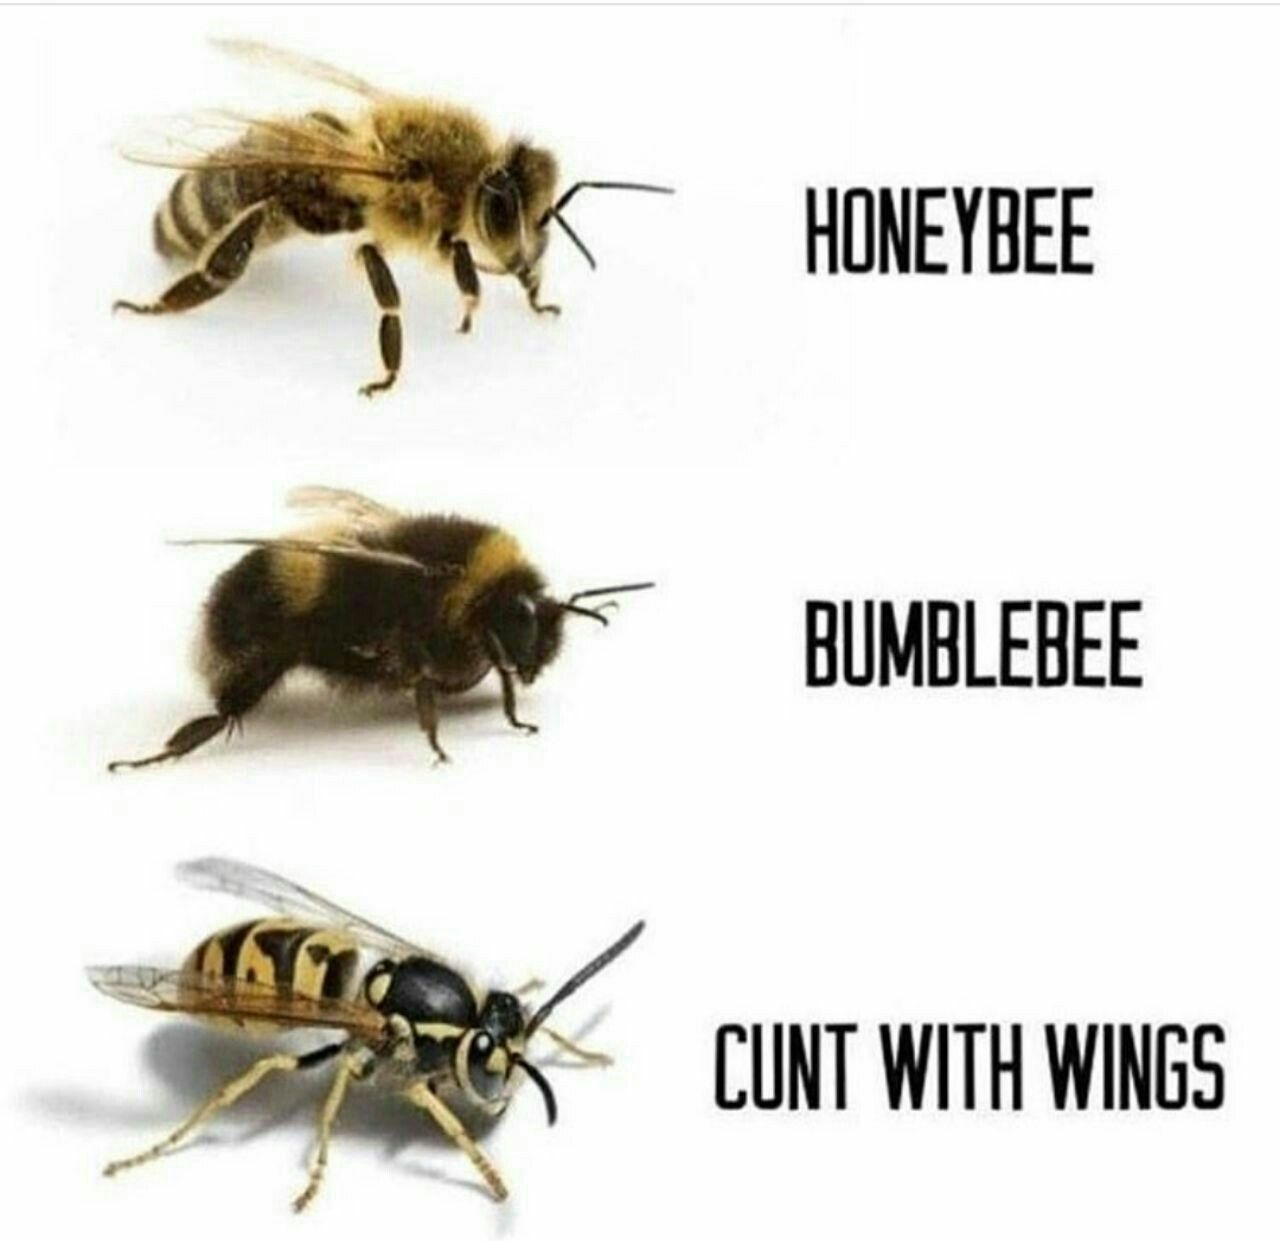 Pin By Andanda On Pentru Cand Esti Trista Bee Edgy Memes Funny Memes